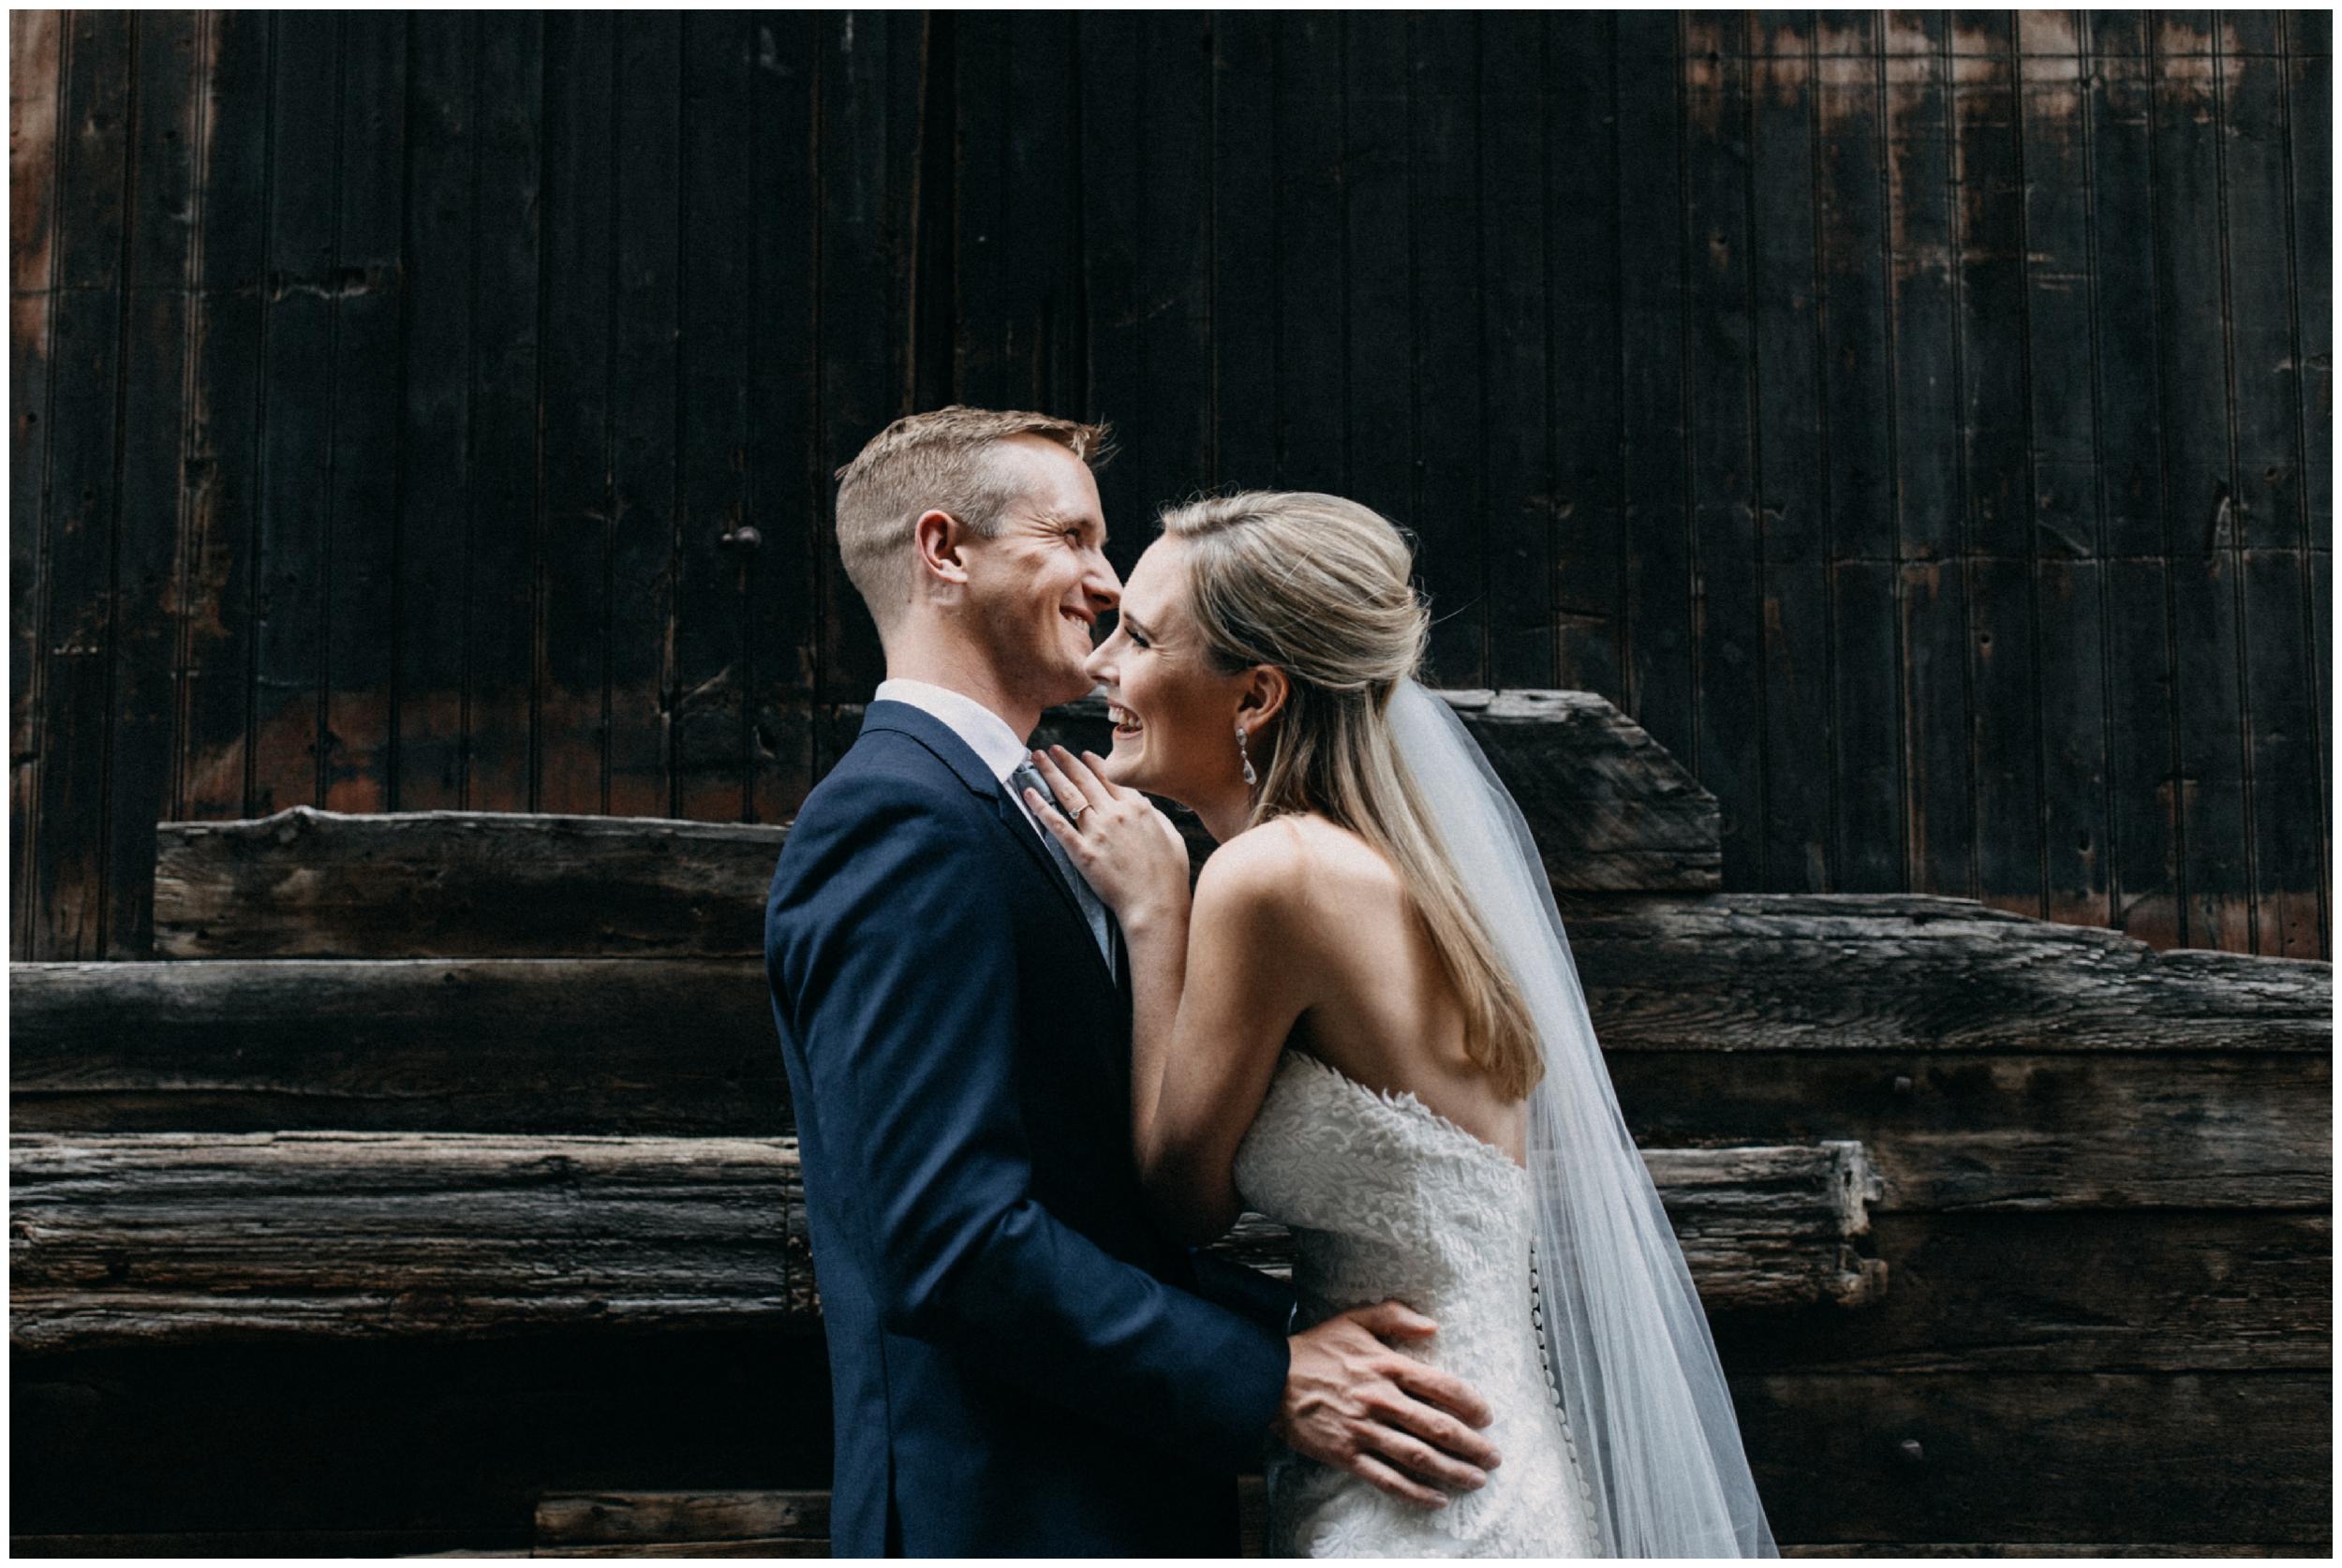 Warehouse wedding in Minneapolis